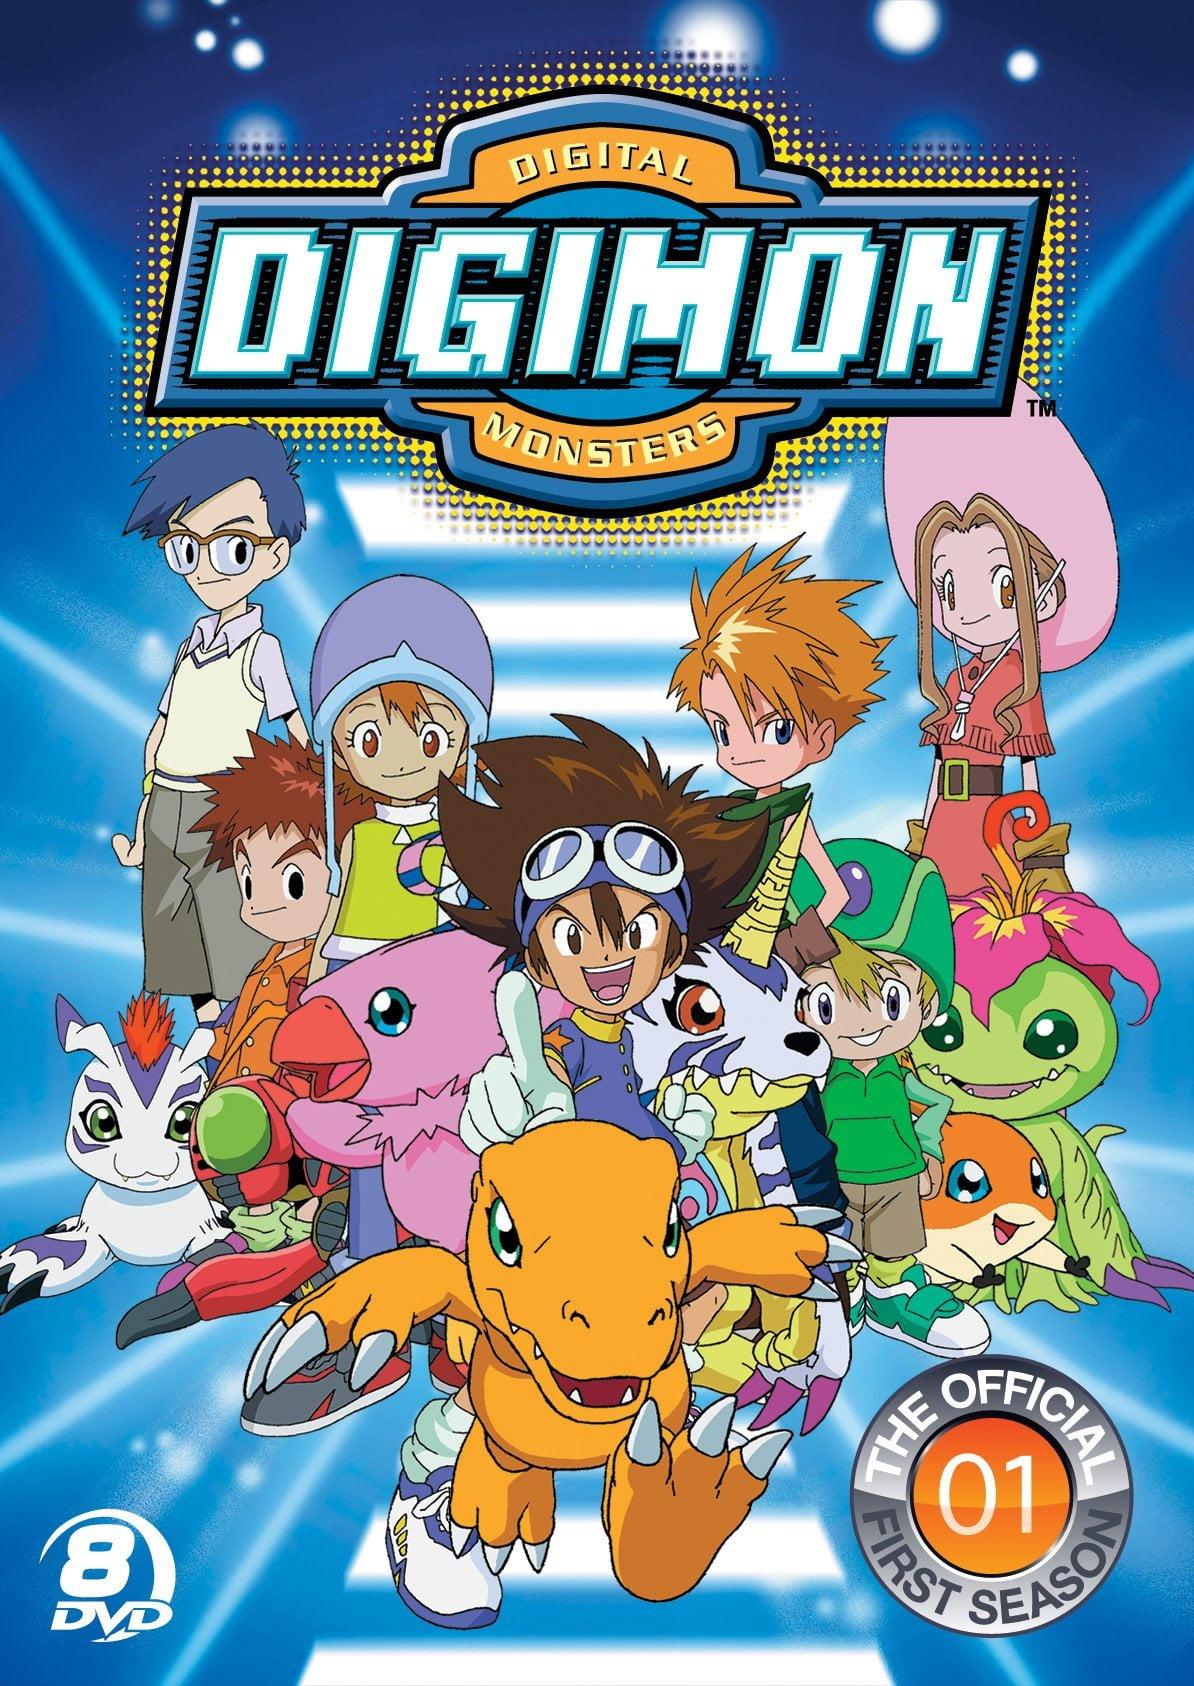 Digimon Adventure The Movie ดิจิมอนแอดเวนเจอร์ เดอะมูฟวี่ 1 [พากย์ไทย]